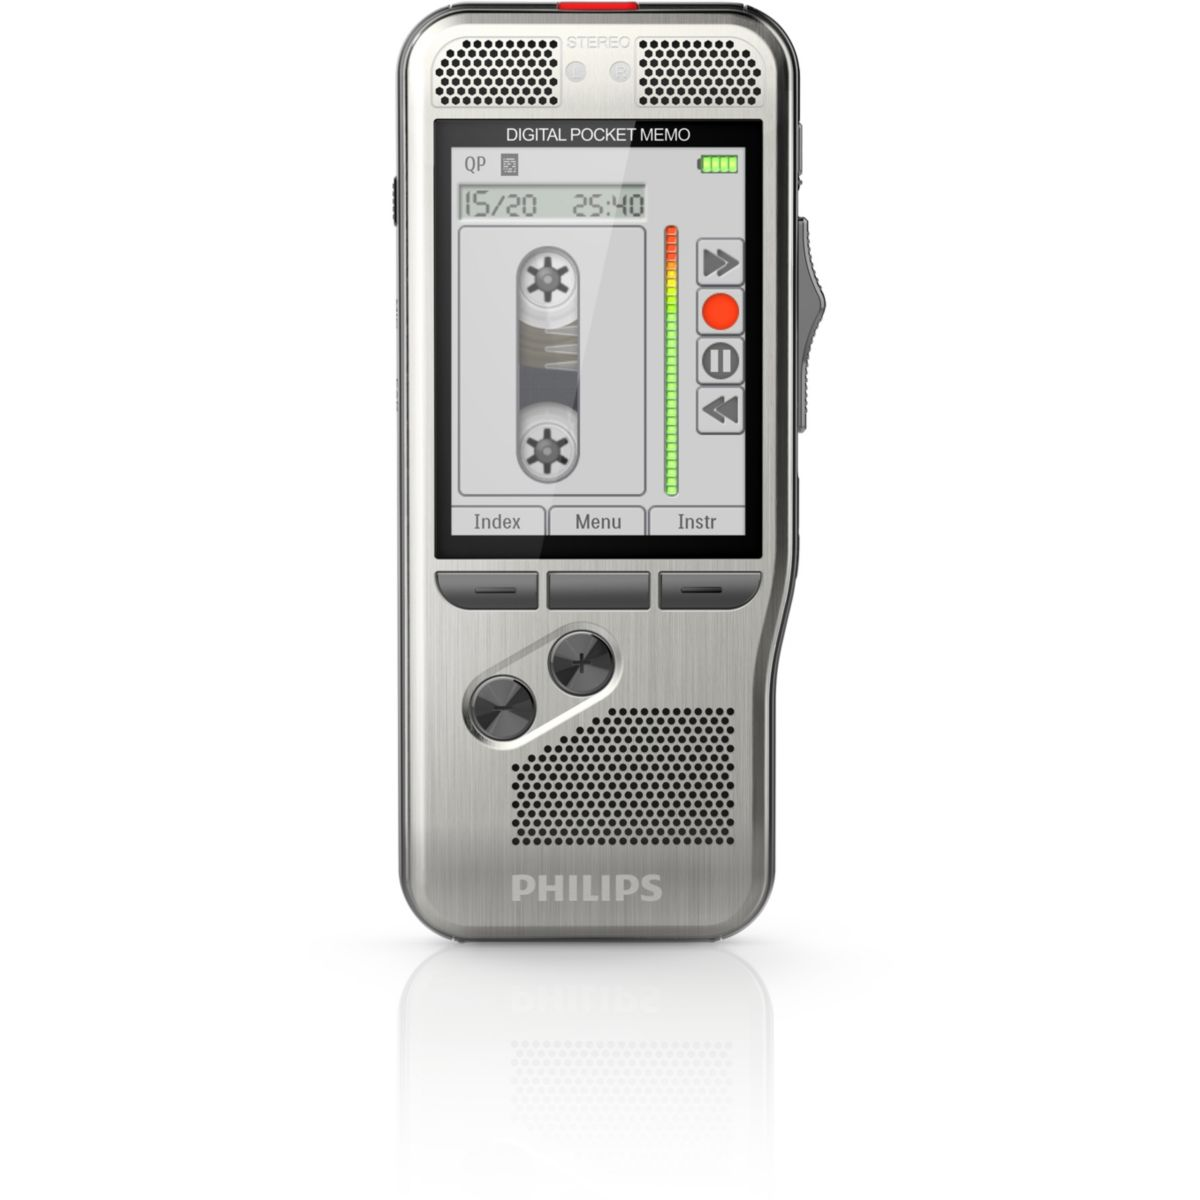 Dictaphone PHILIPS Pocket-Mémo DPM7200 (photo)